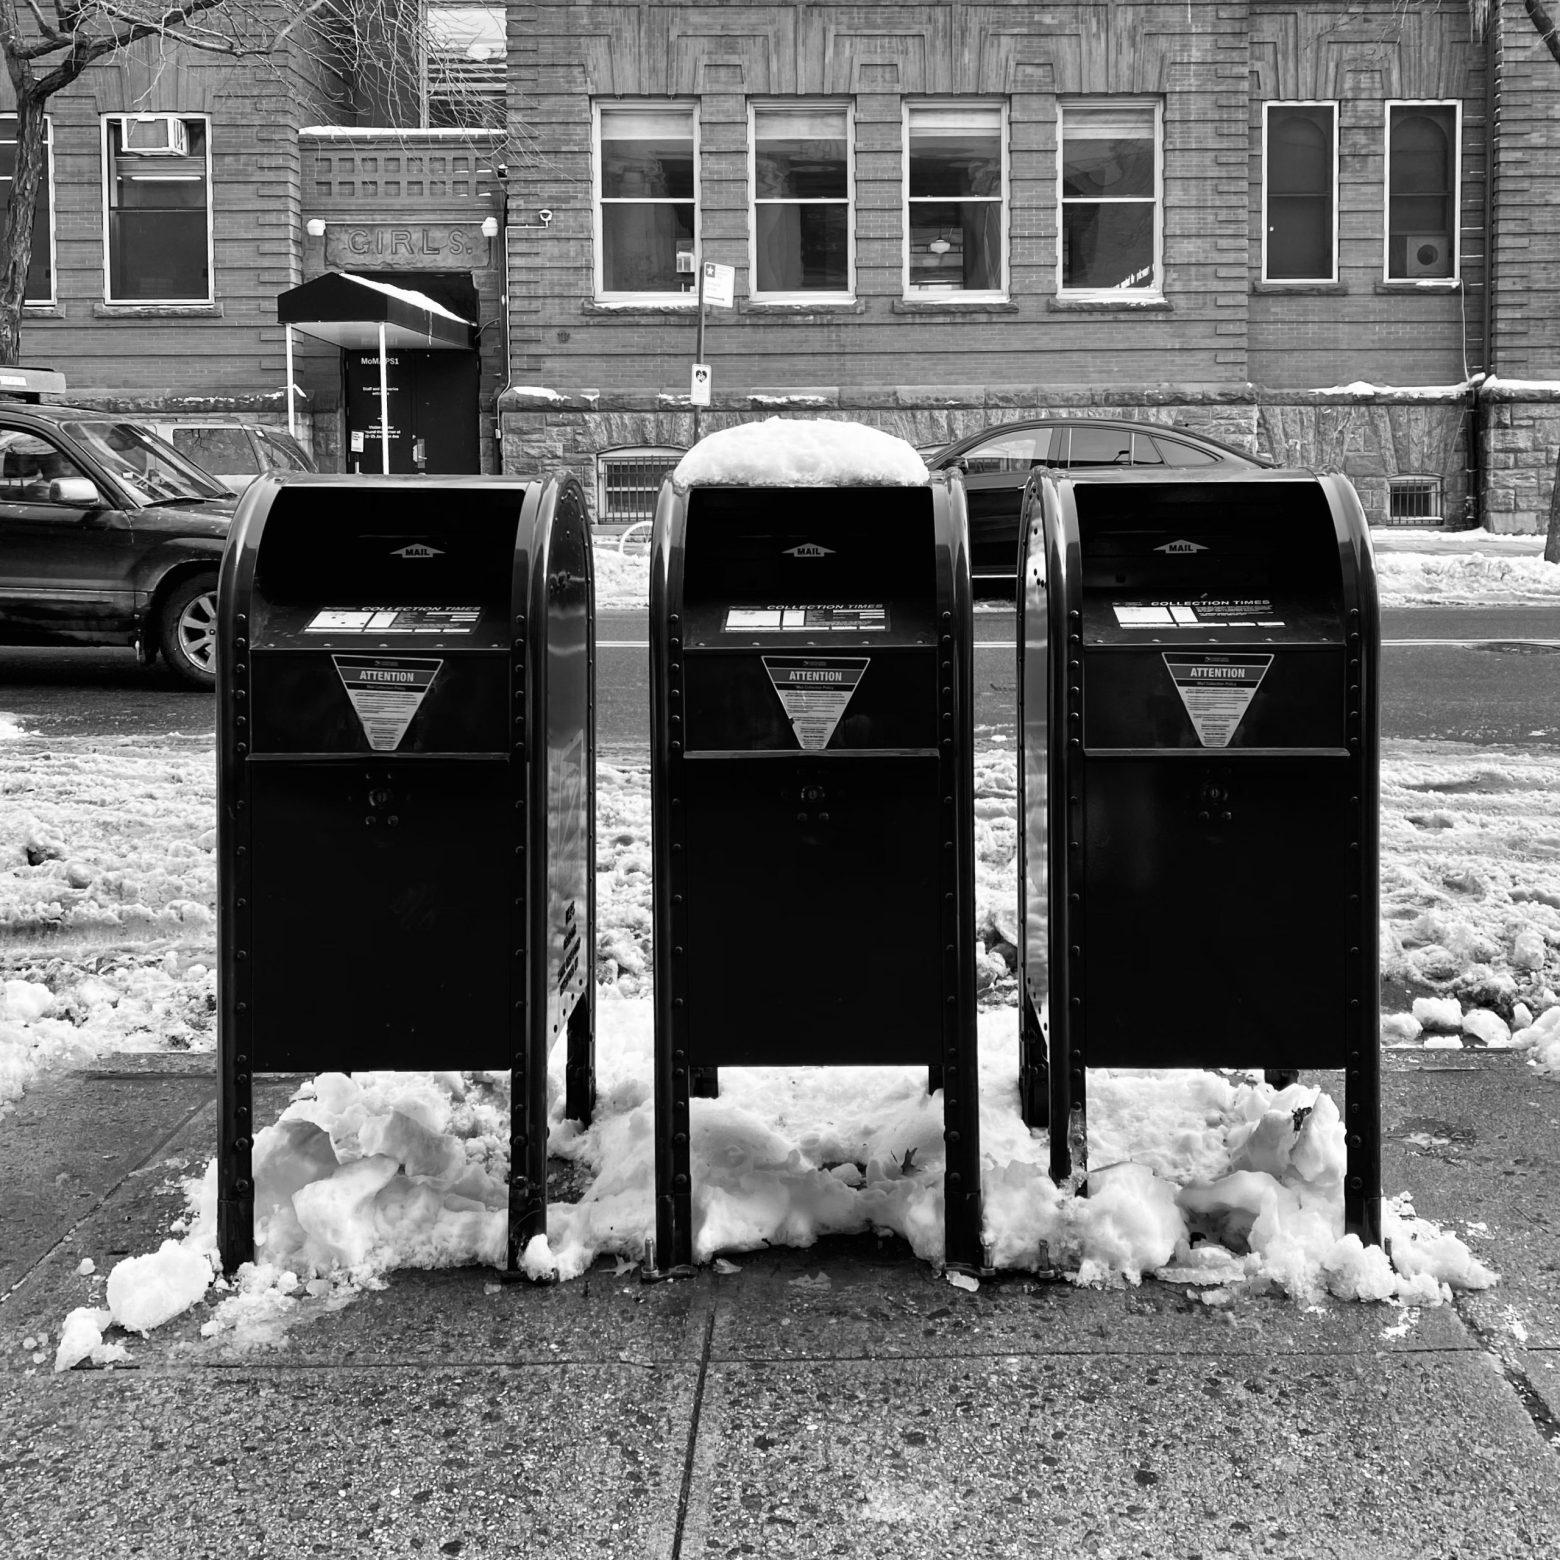 USPS Mailbox Receptacle